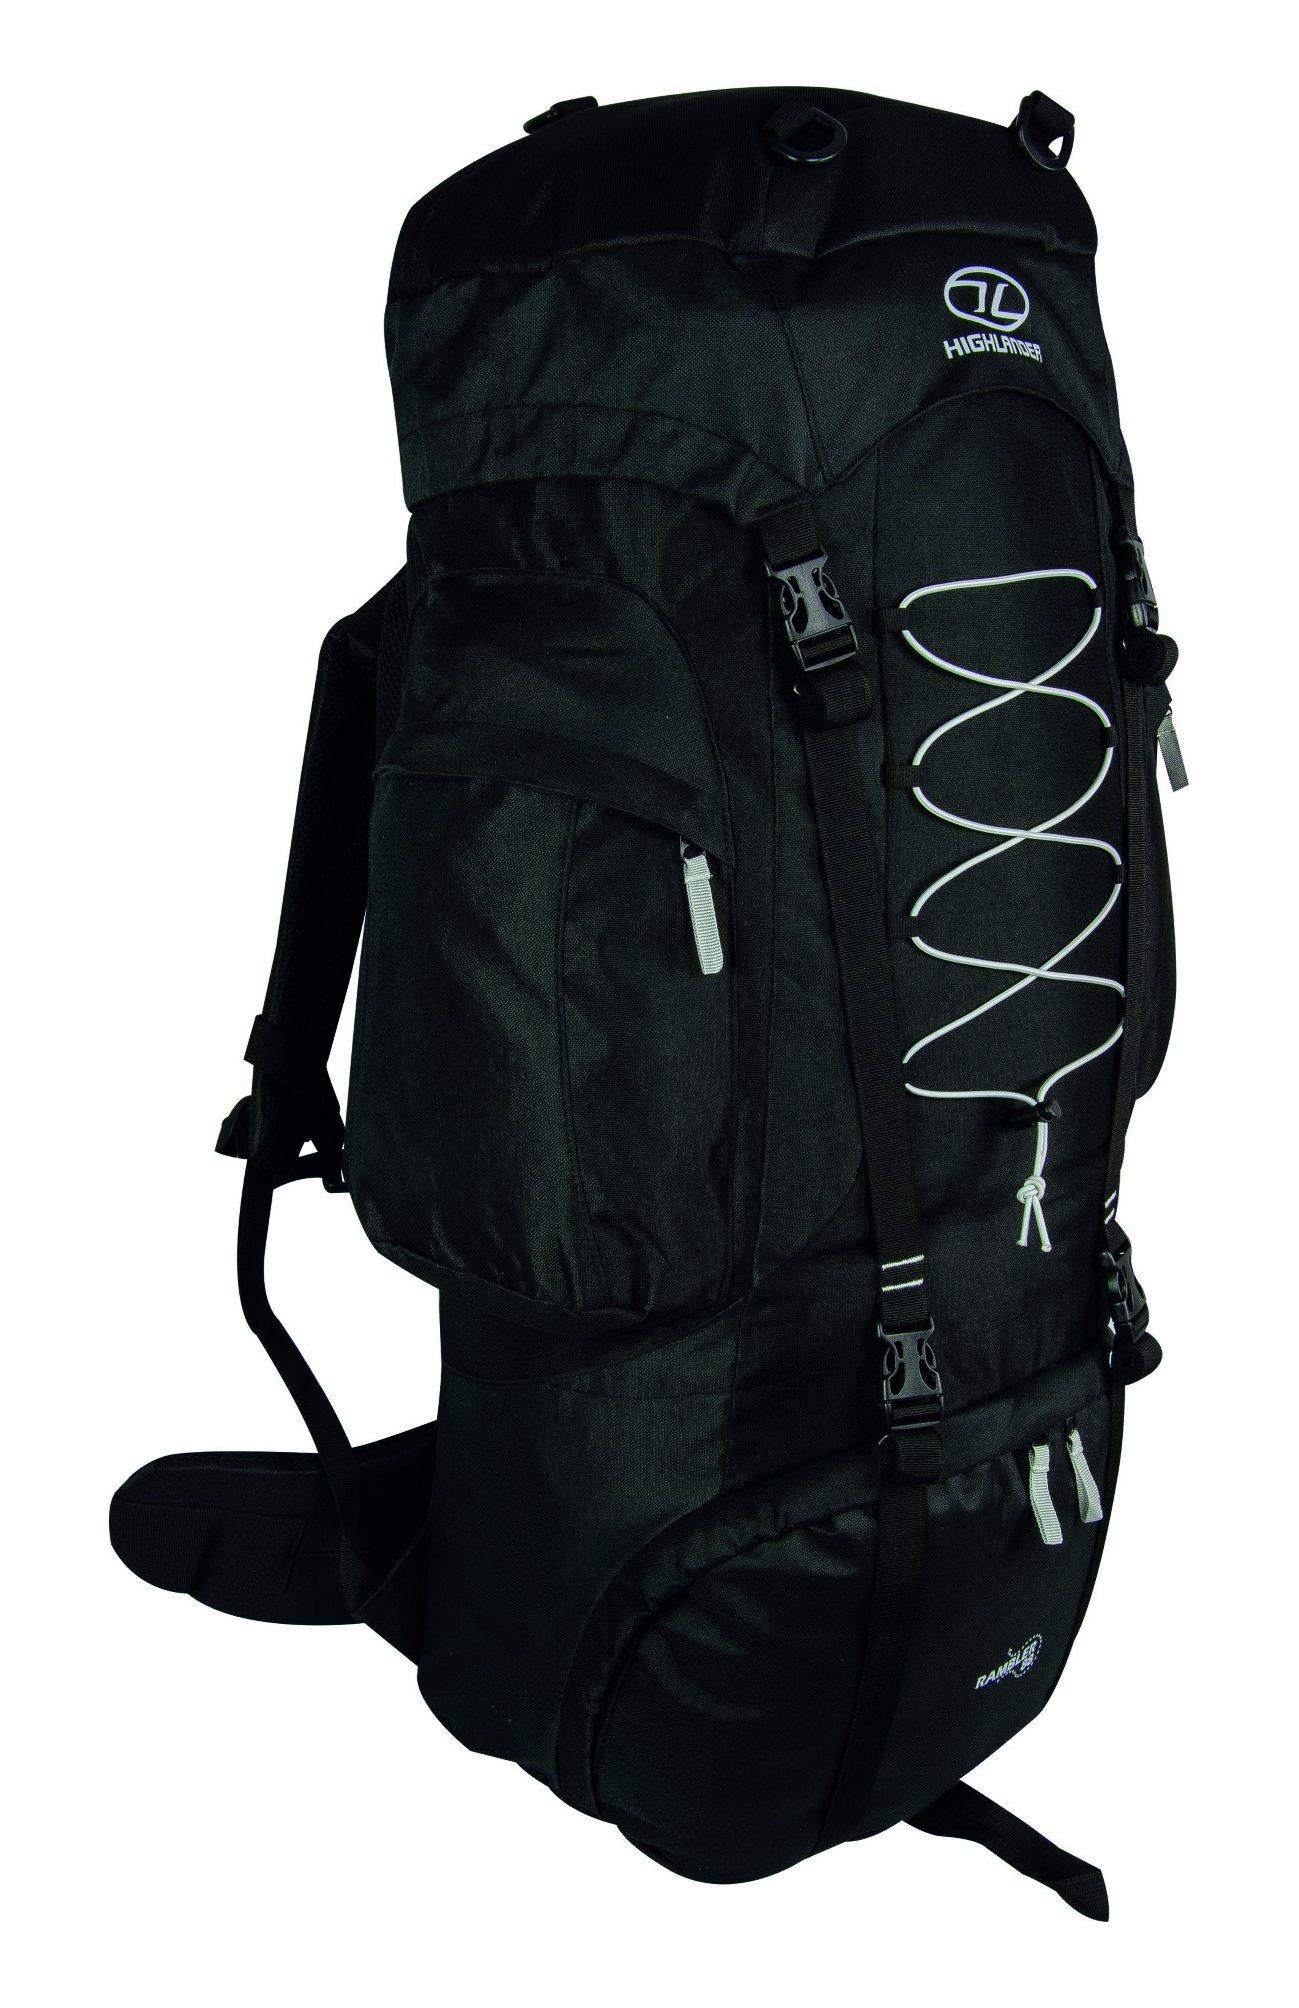 Highlander Rambler Rucksack ― Small, Medium & Large Unisex Backpacks for Men & Women Hiking, Rambling, Backpacking… 1